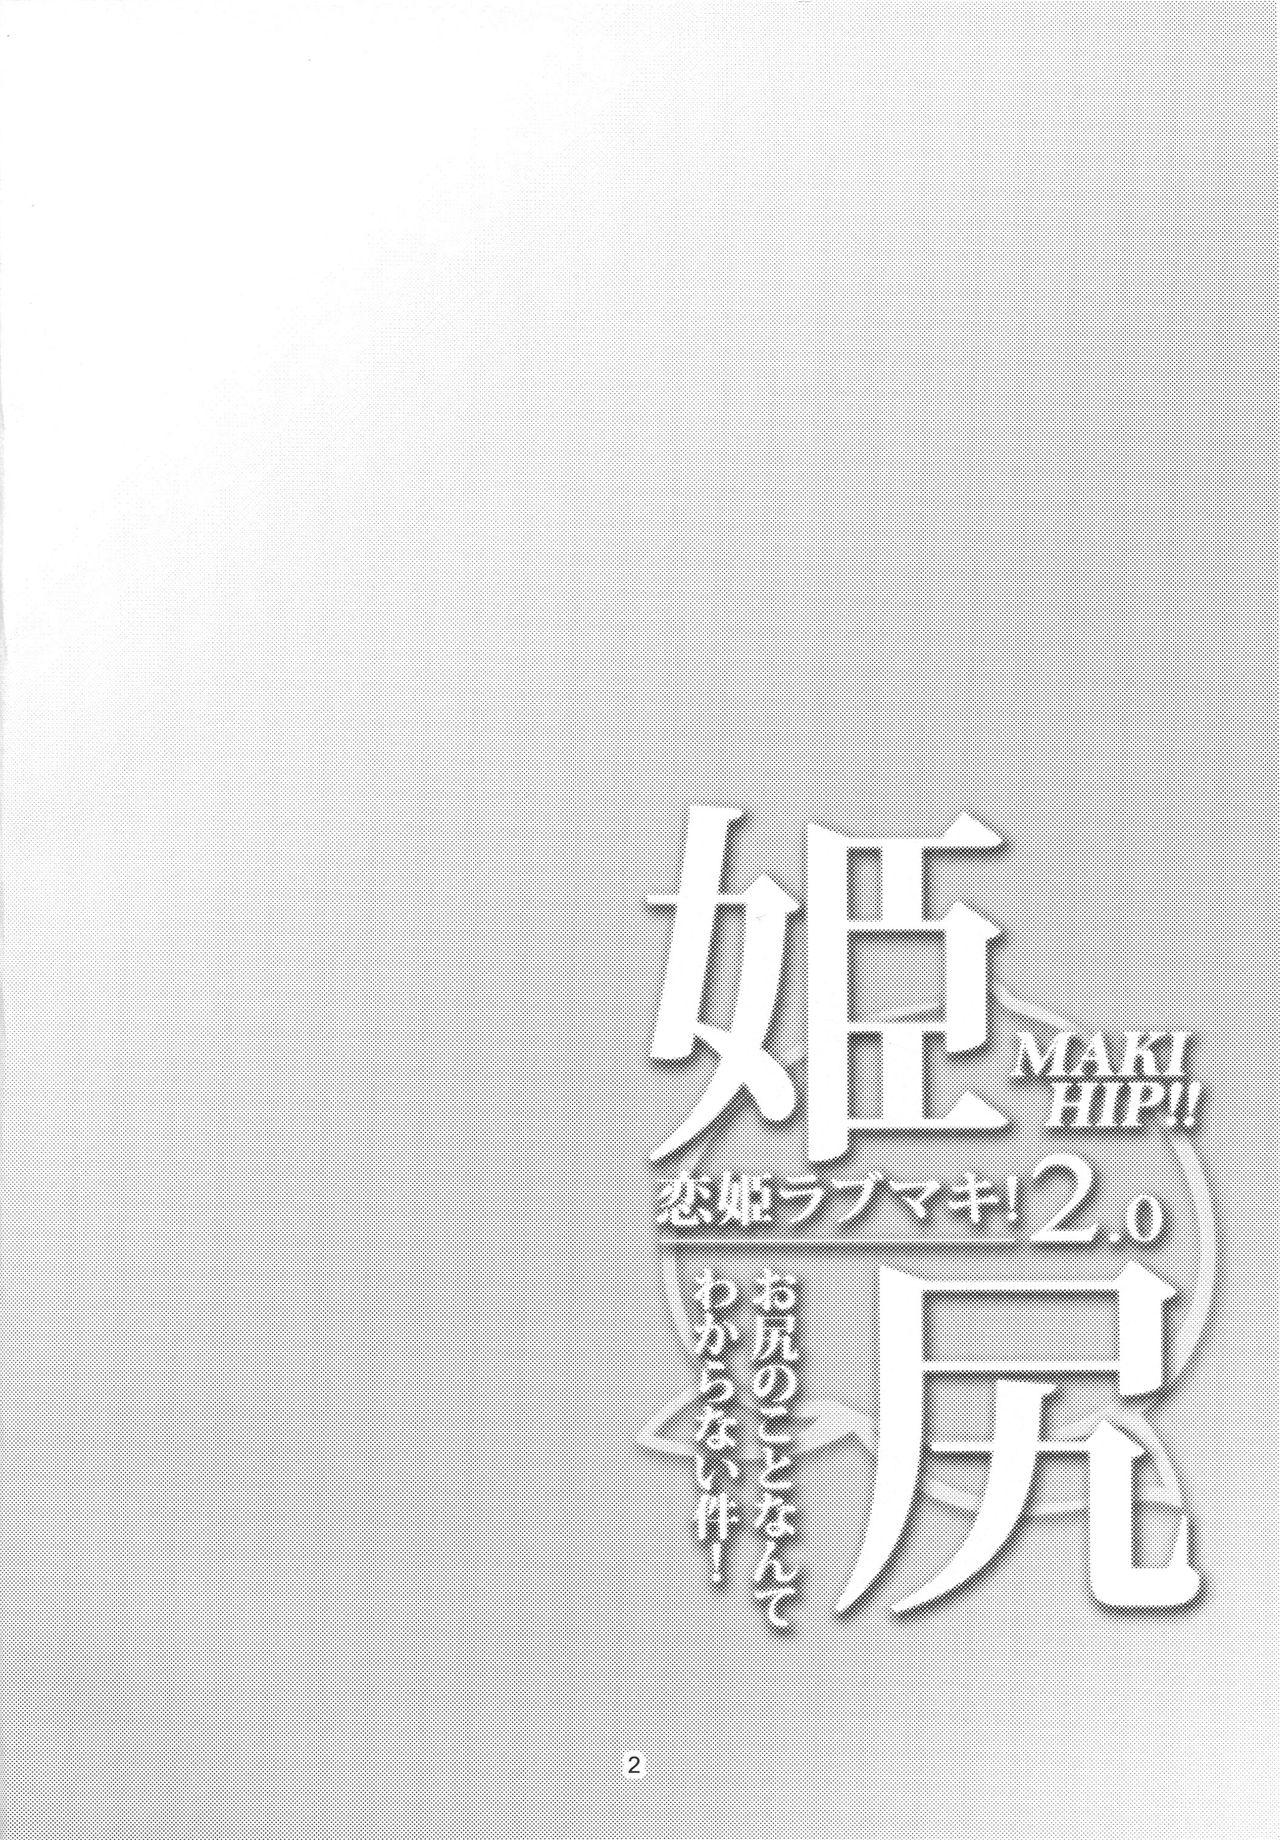 Hime Shiri -Maki Hip!! Koi Hime Love Maki! 2.0 2